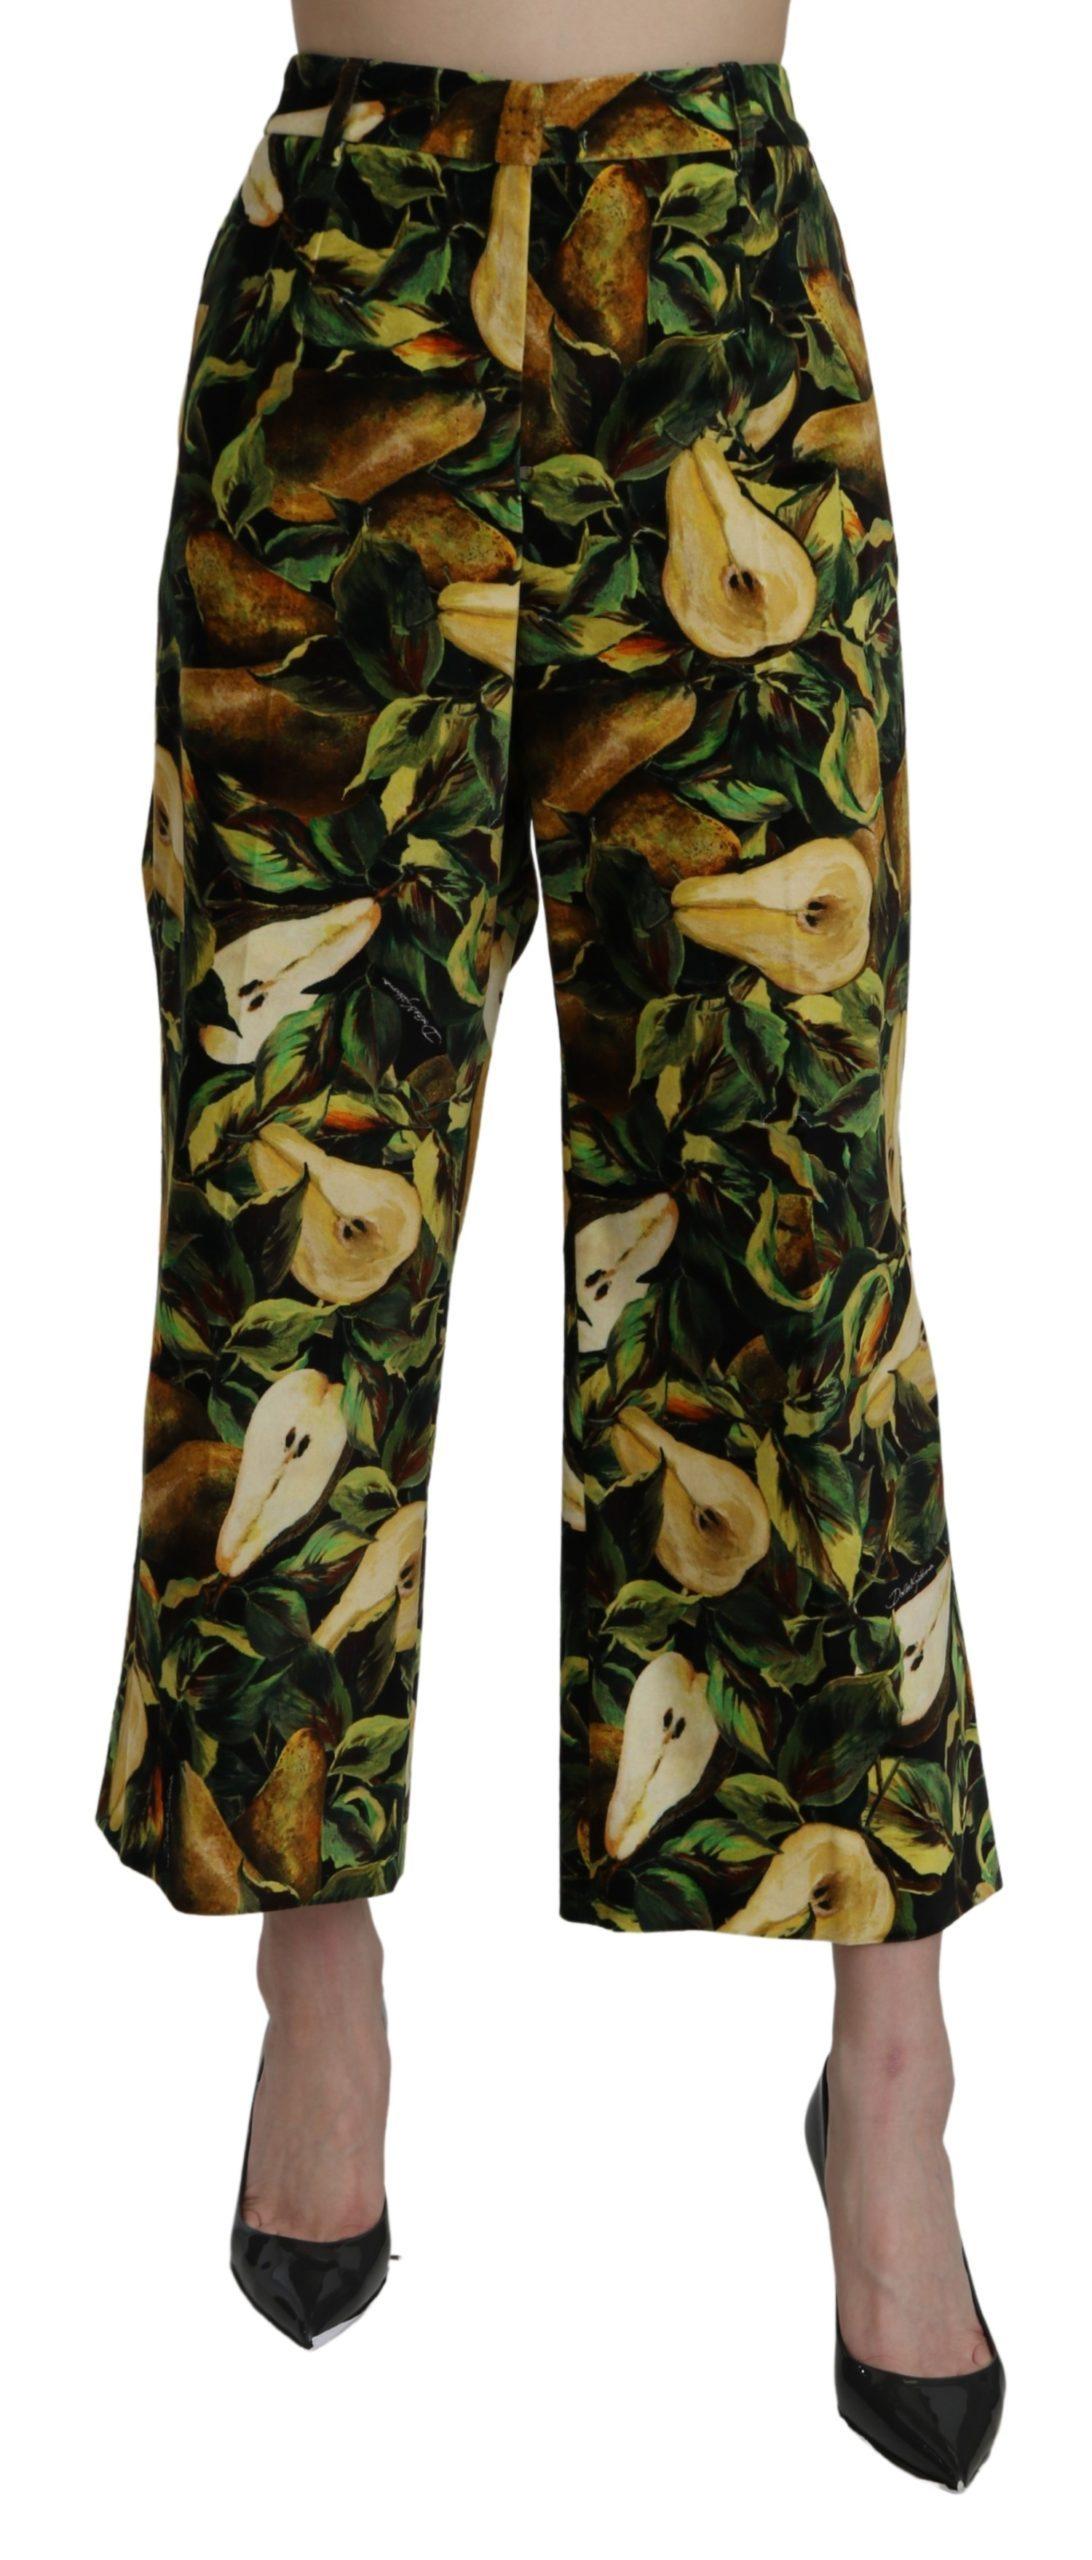 Dolce & Gabbana Women's Pear High Waist Cotton Trouser Black PAN71066 - IT48 XXL